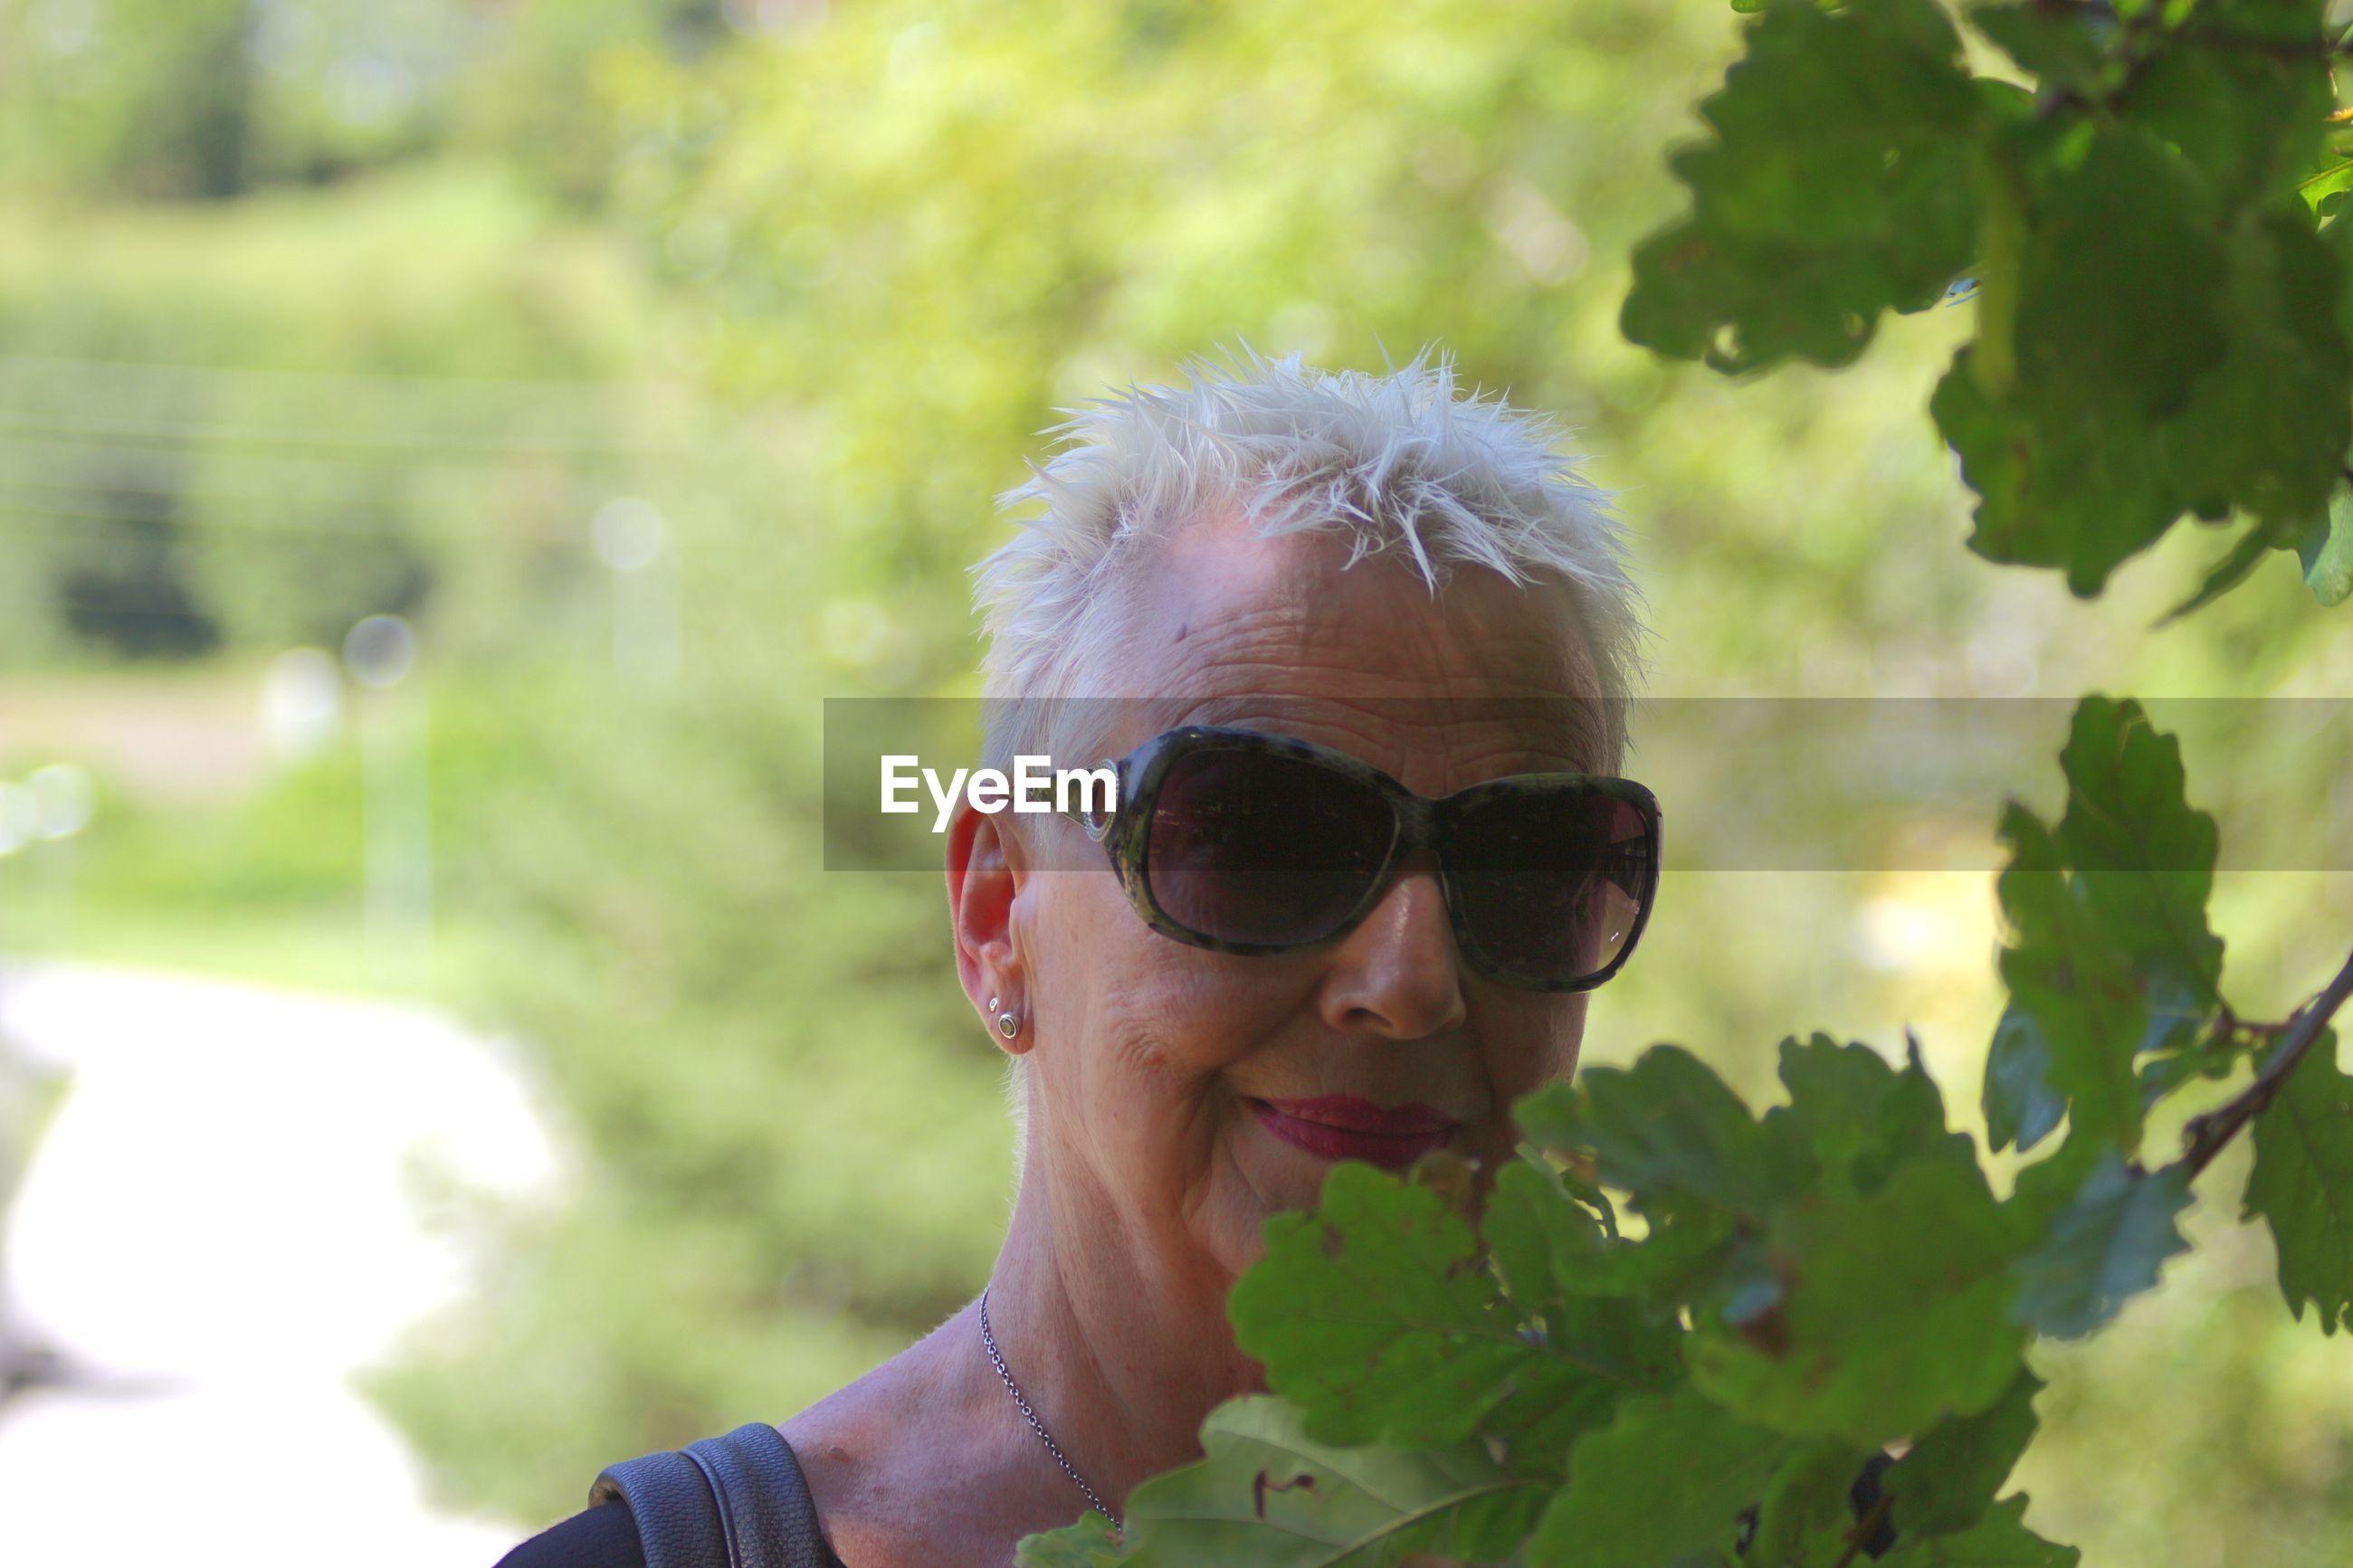 Portrait of grandmother wearing sunglasses